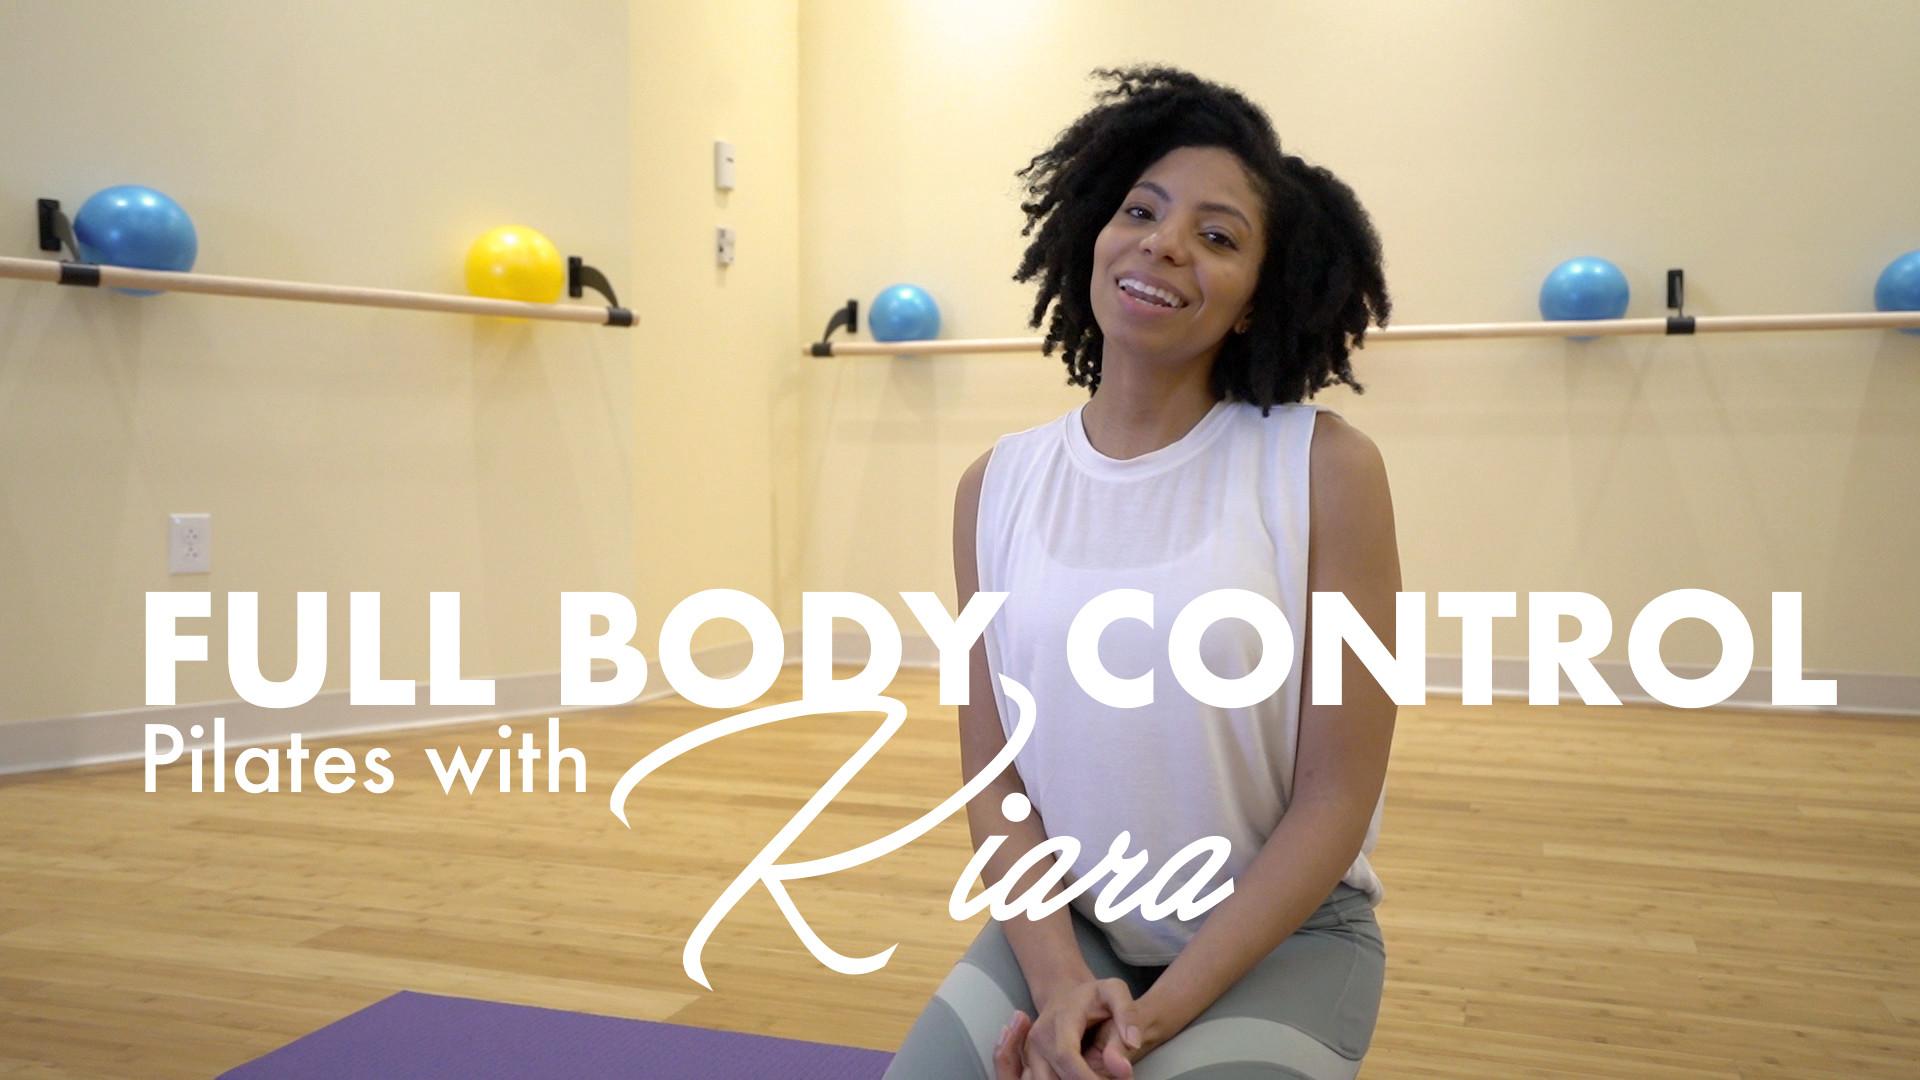 FULL BODY CONTROL: KIARA